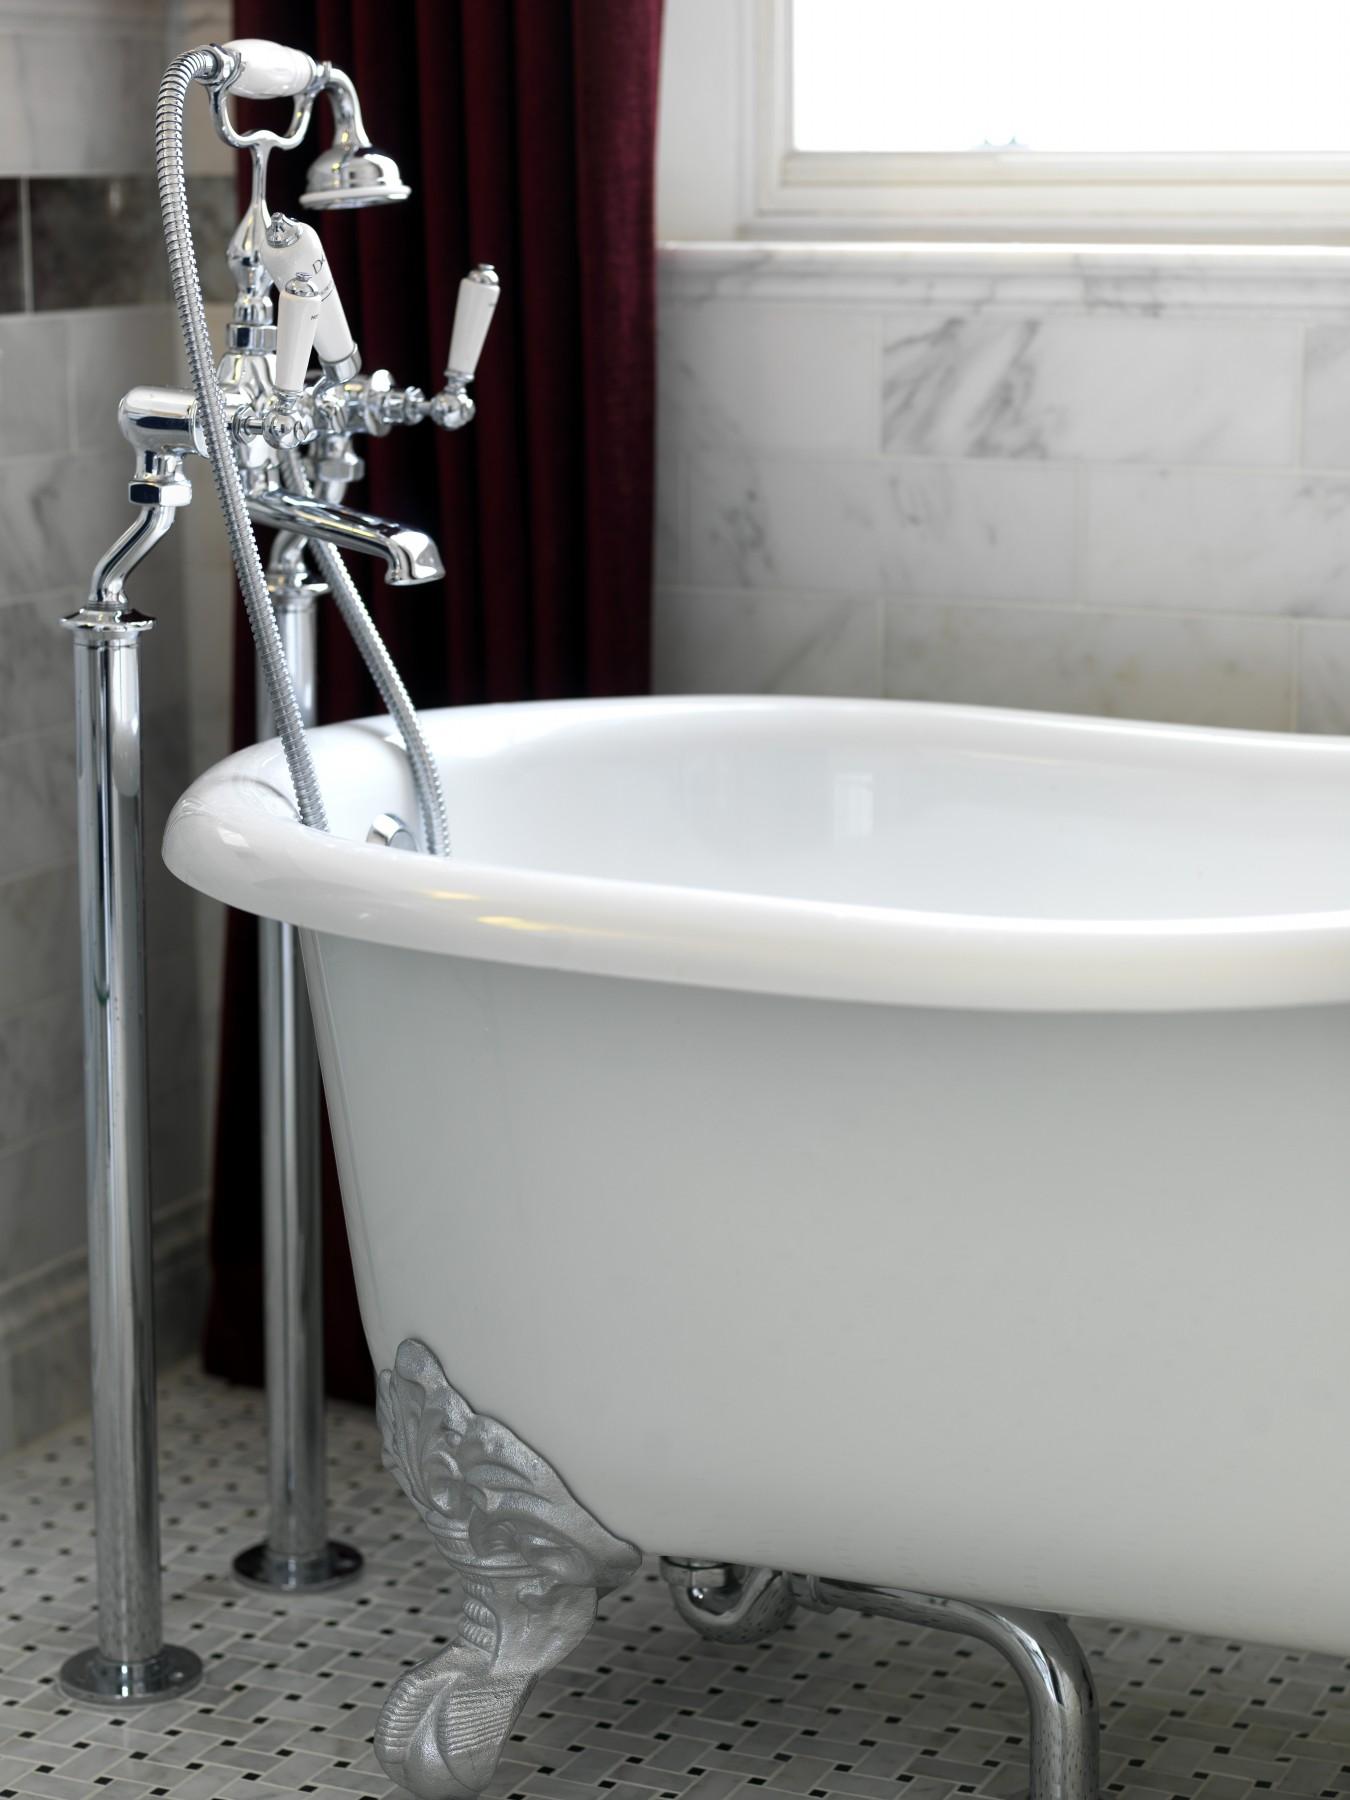 bath taps.jpg